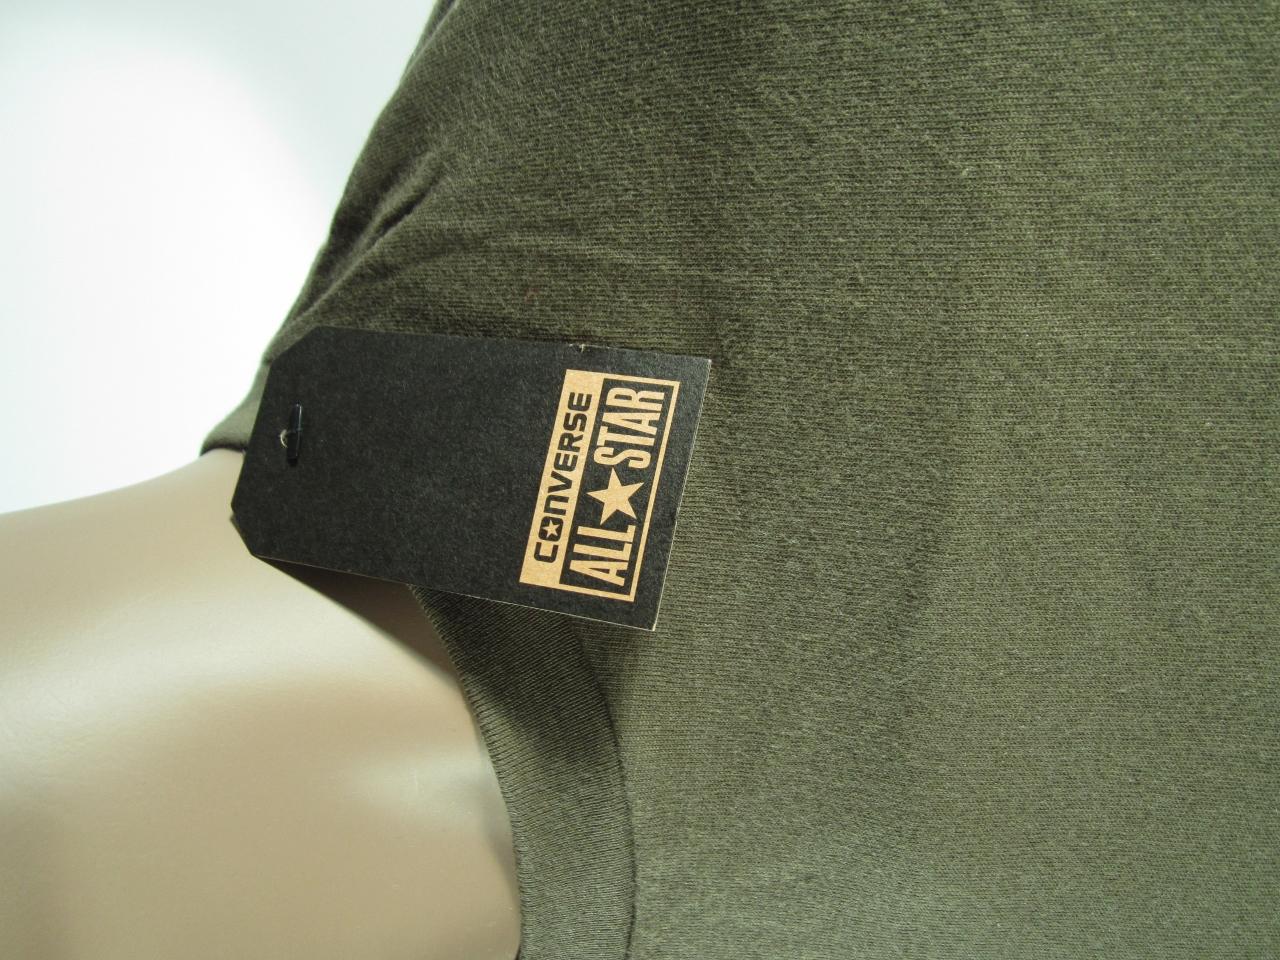 fc640870f9d0 ... Retro Converse Chuck Taylor All Star Faded T-Shirt M NWT Rare -  Thumbnail 2